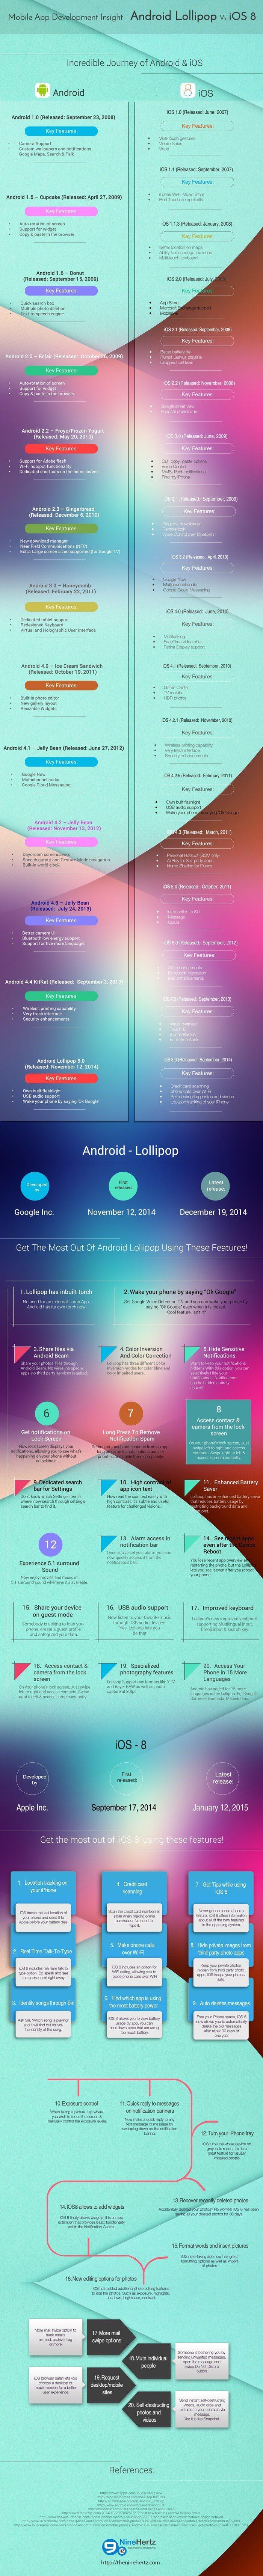 Android-Lollipop-vs-iOS-8-Infographic